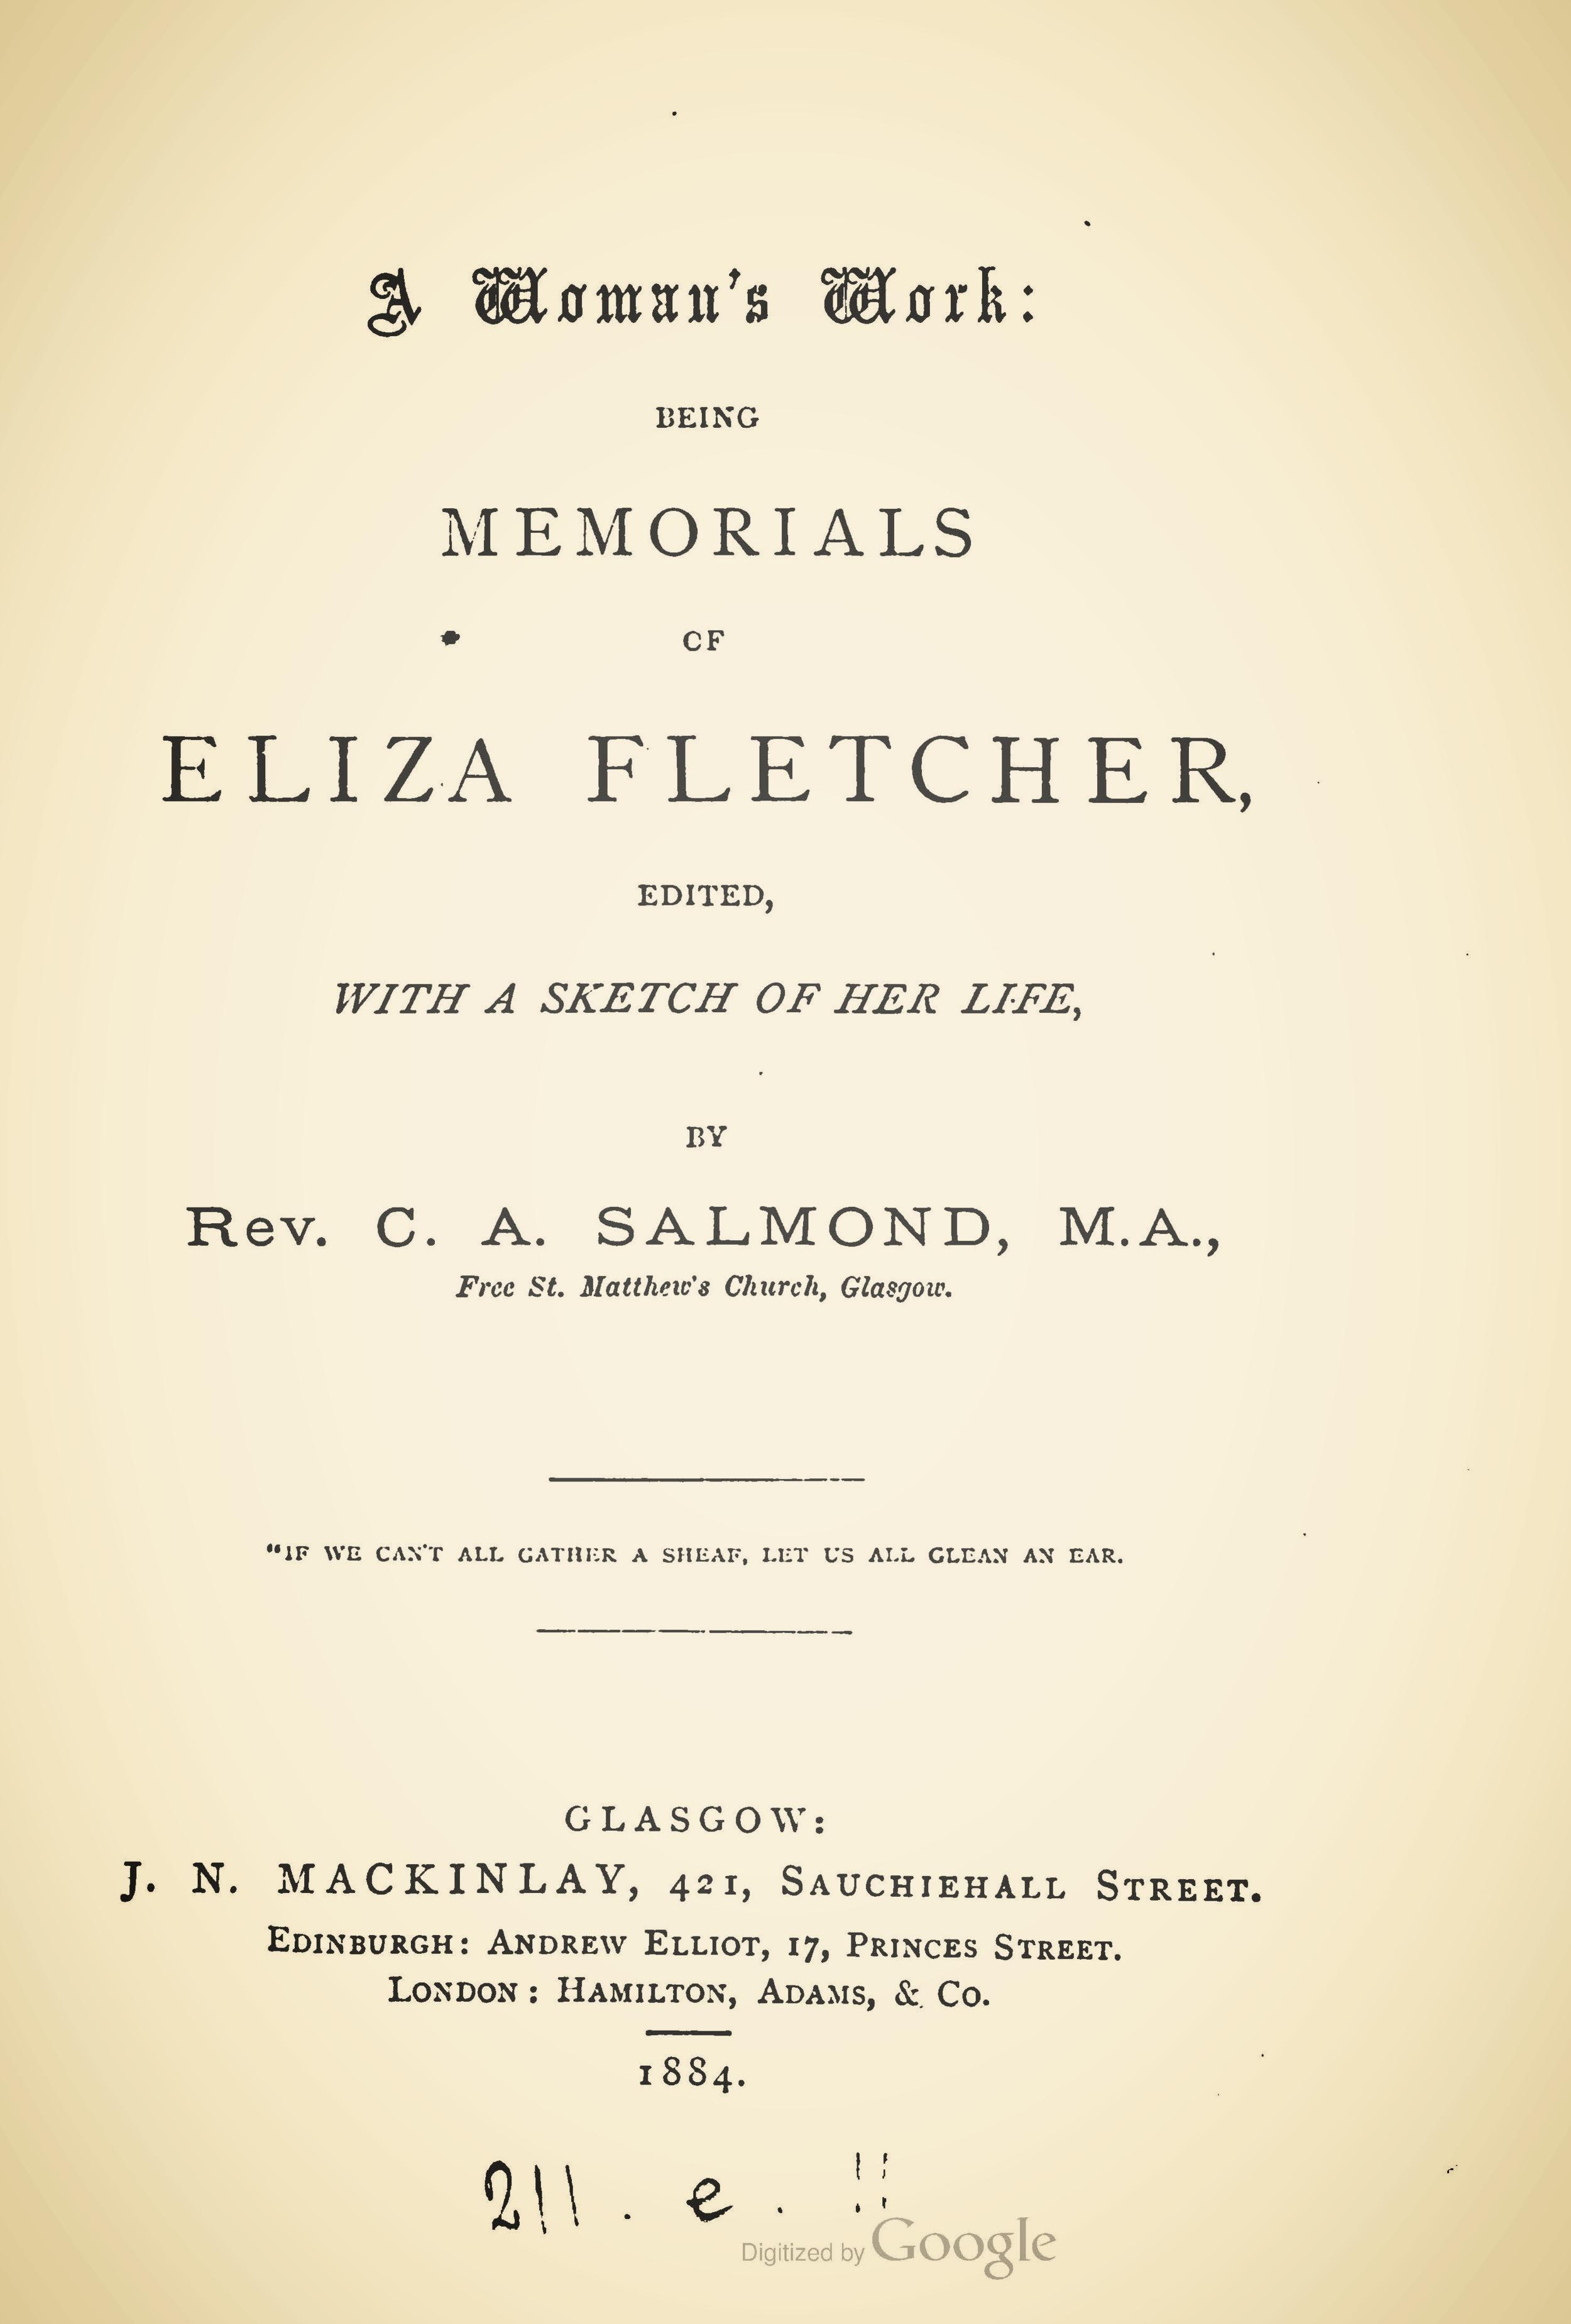 Salmond, Charles Adamson, A Womans Work Memorials of Eliza Fletcher Title Page.jpg